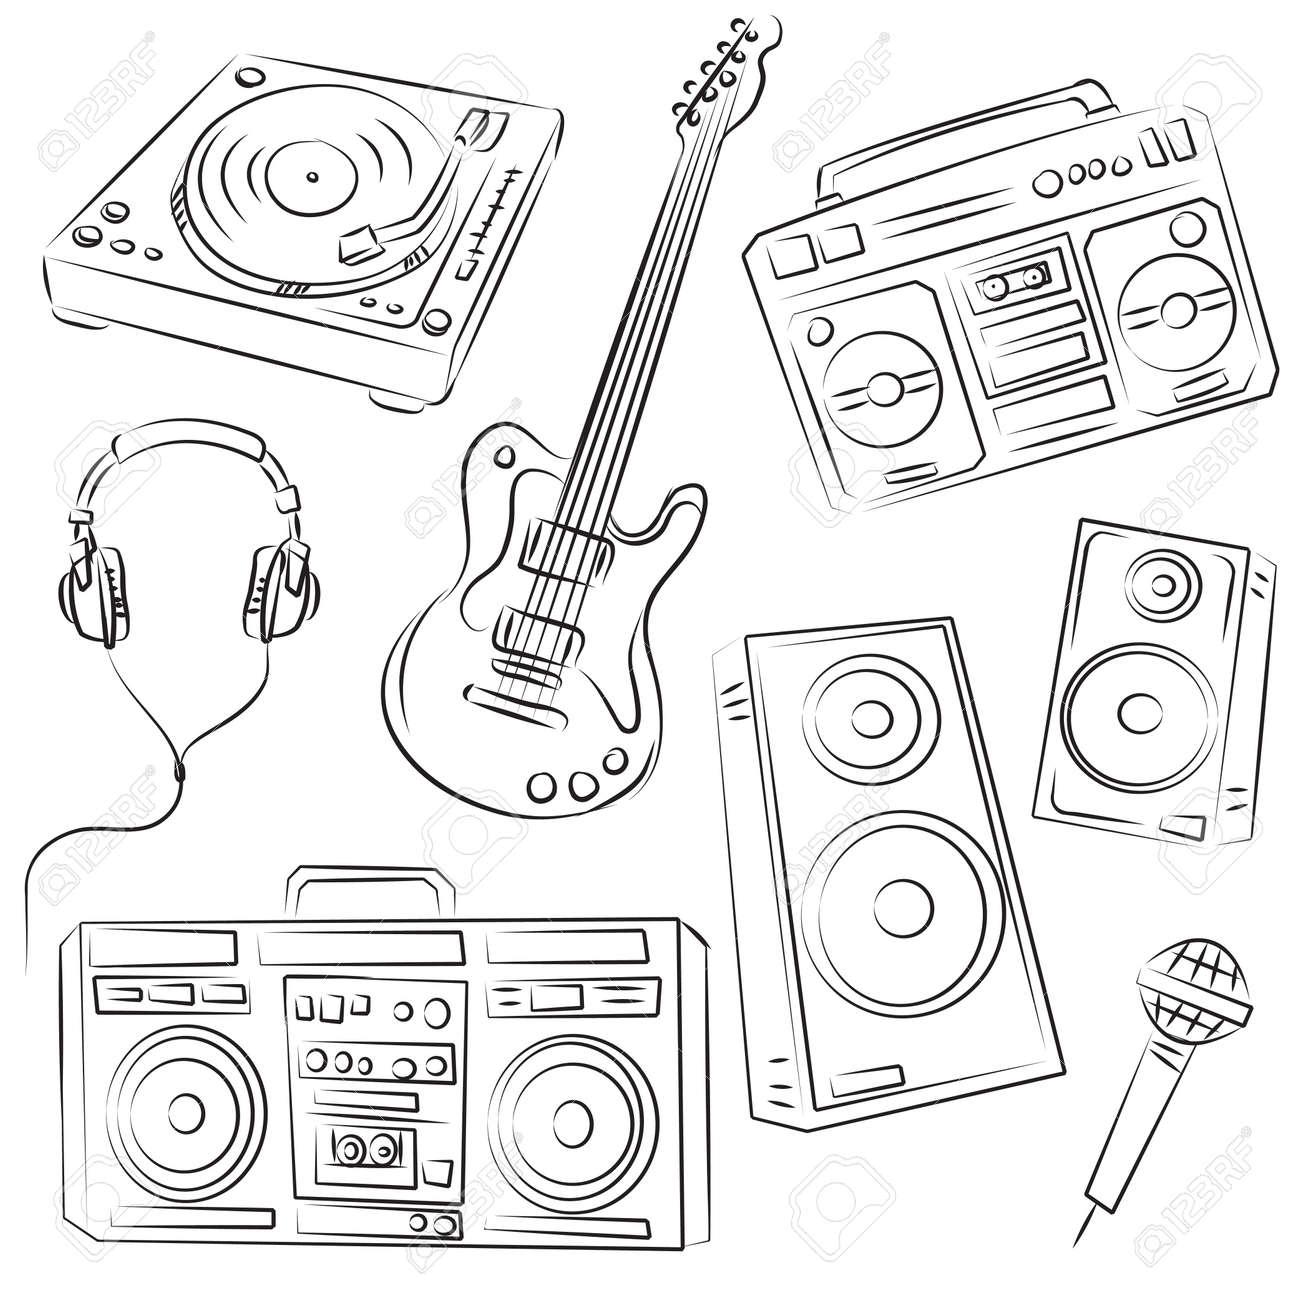 Music Set Sketch Stock Vector - 8152643